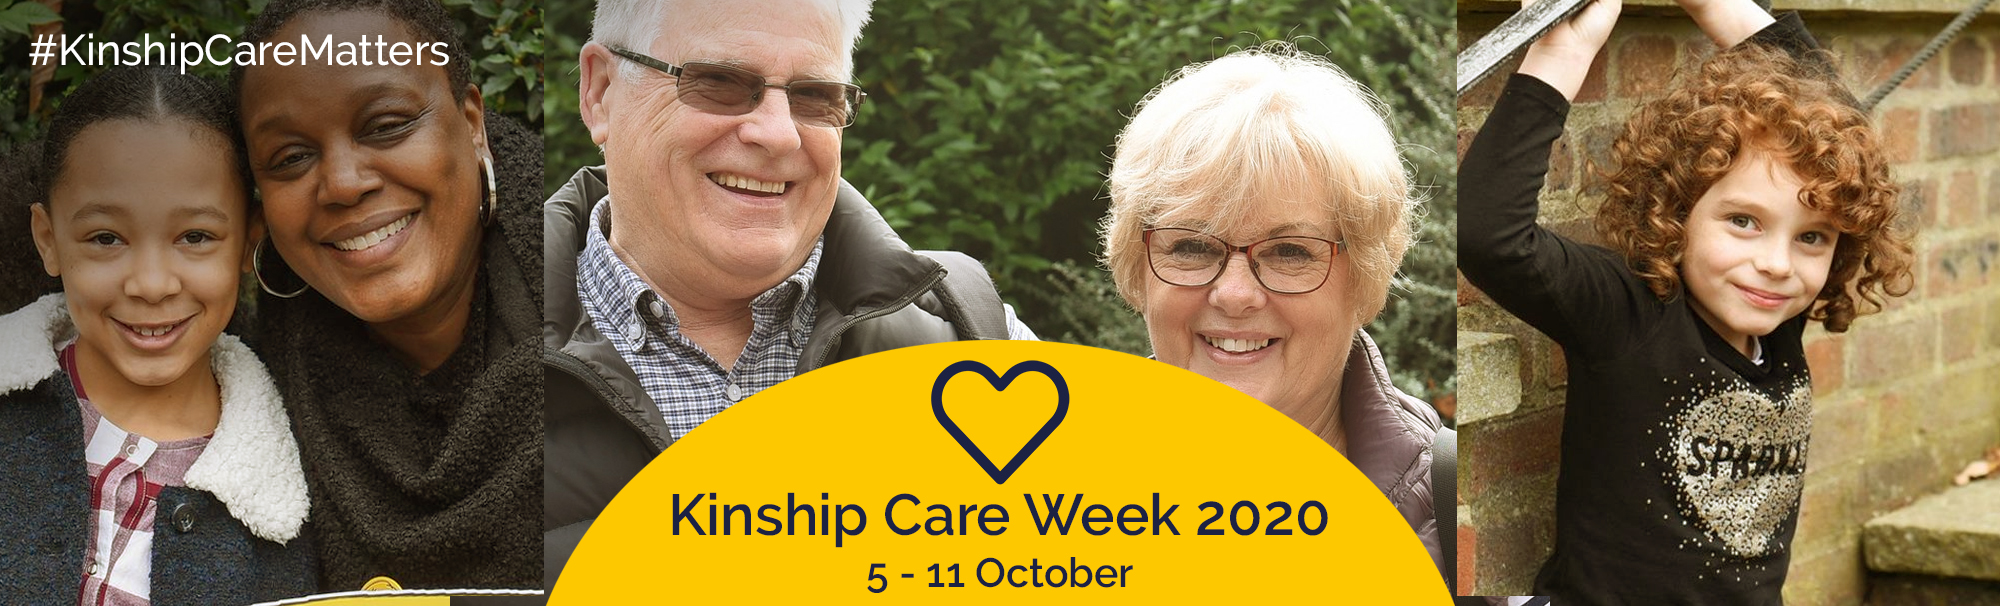 kinship care week 2020